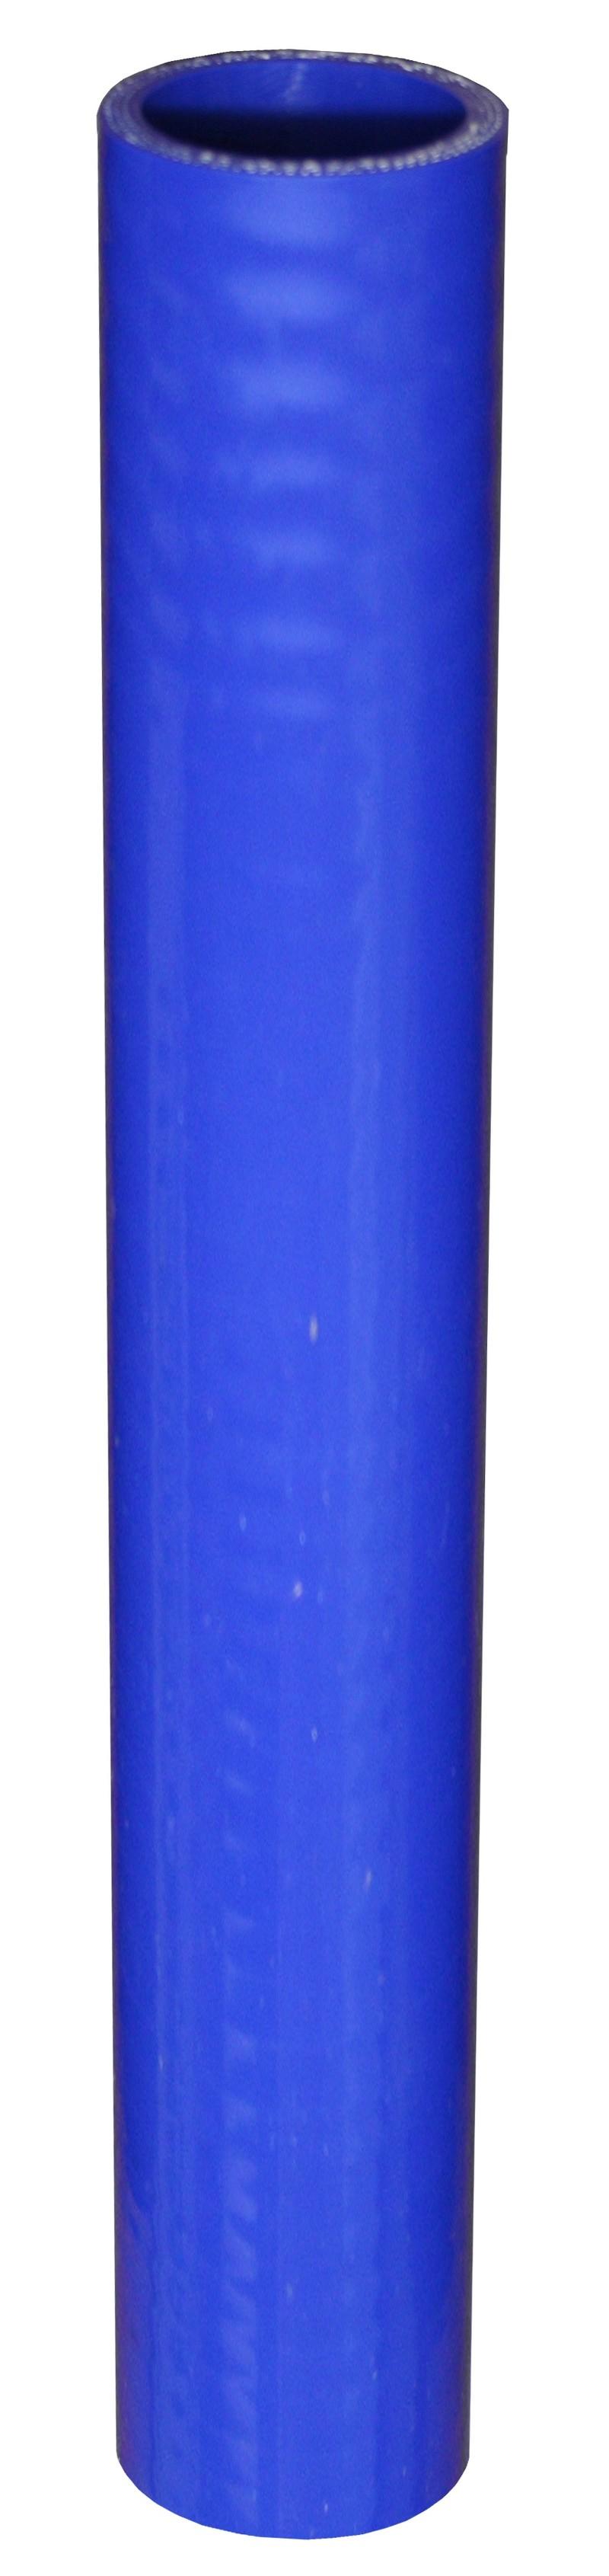 Silicon  Blue  Radiator   Hose  12 Inch Length  1.75 I.D.